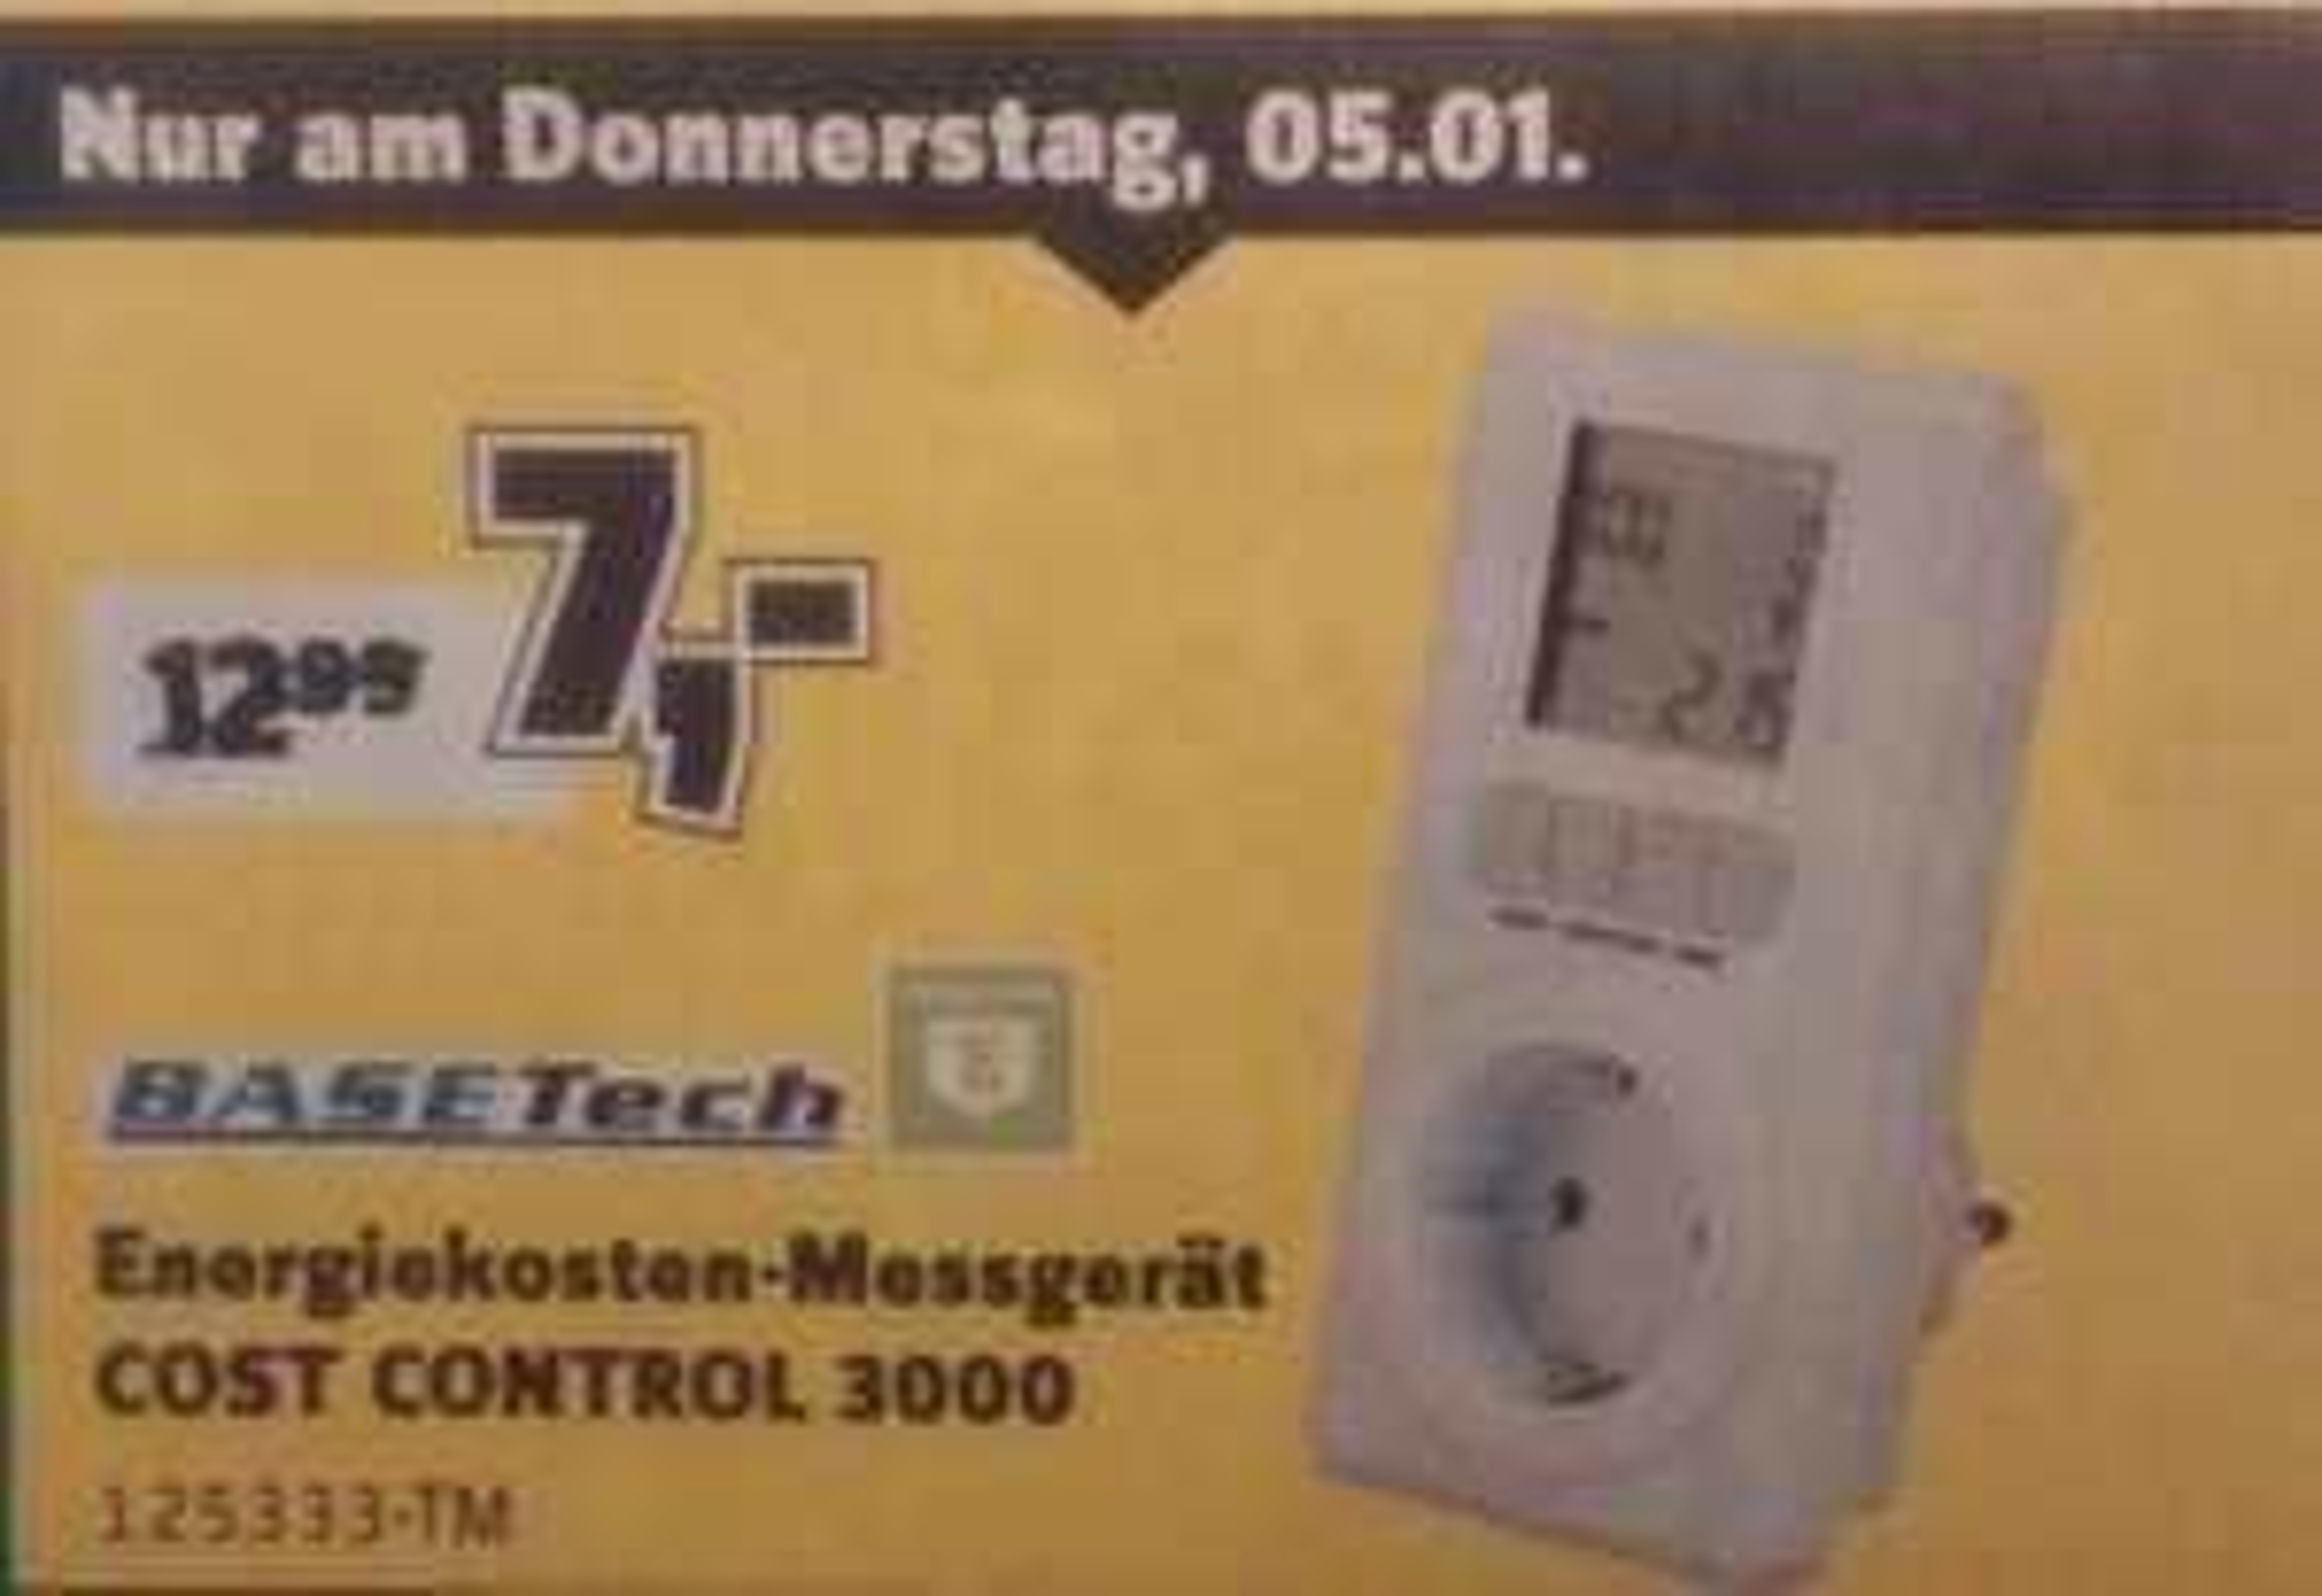 [Conrad bundesweit] Energiekosten-Messgerät Basetech Cost Control 3000 zum Bestpreis